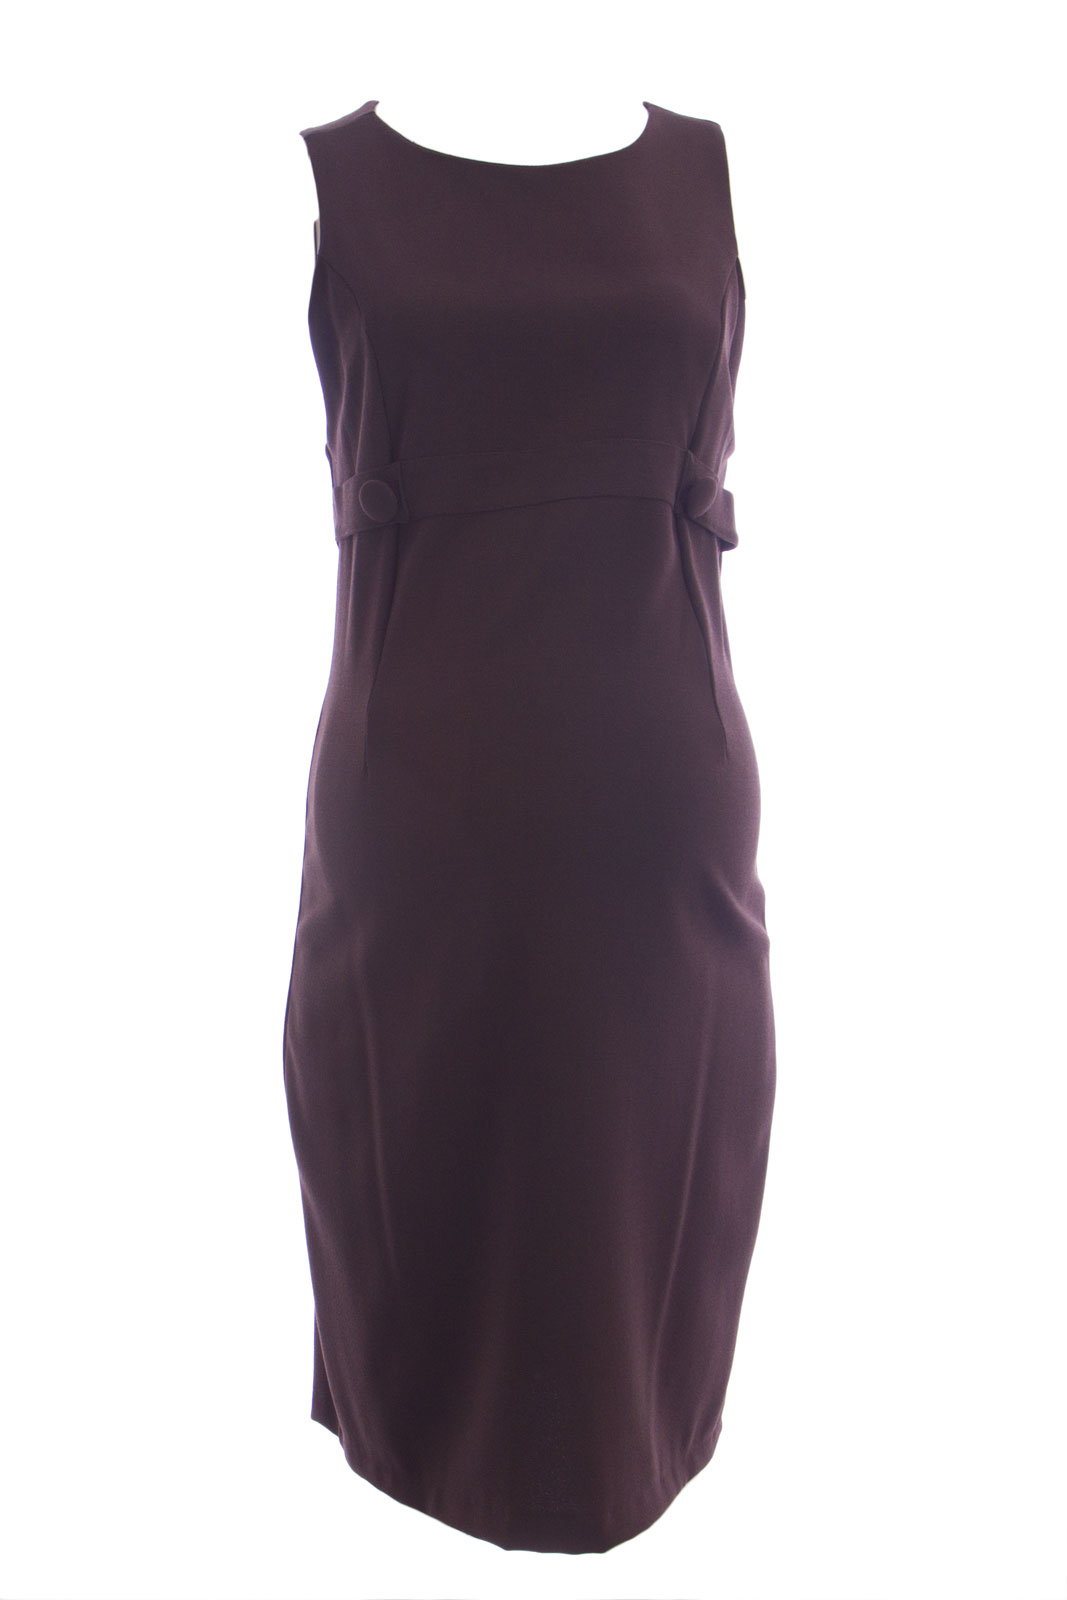 OLIAN Maternity Women/'s Red Print Elizabeth Sleveless Dress S $148 NWT